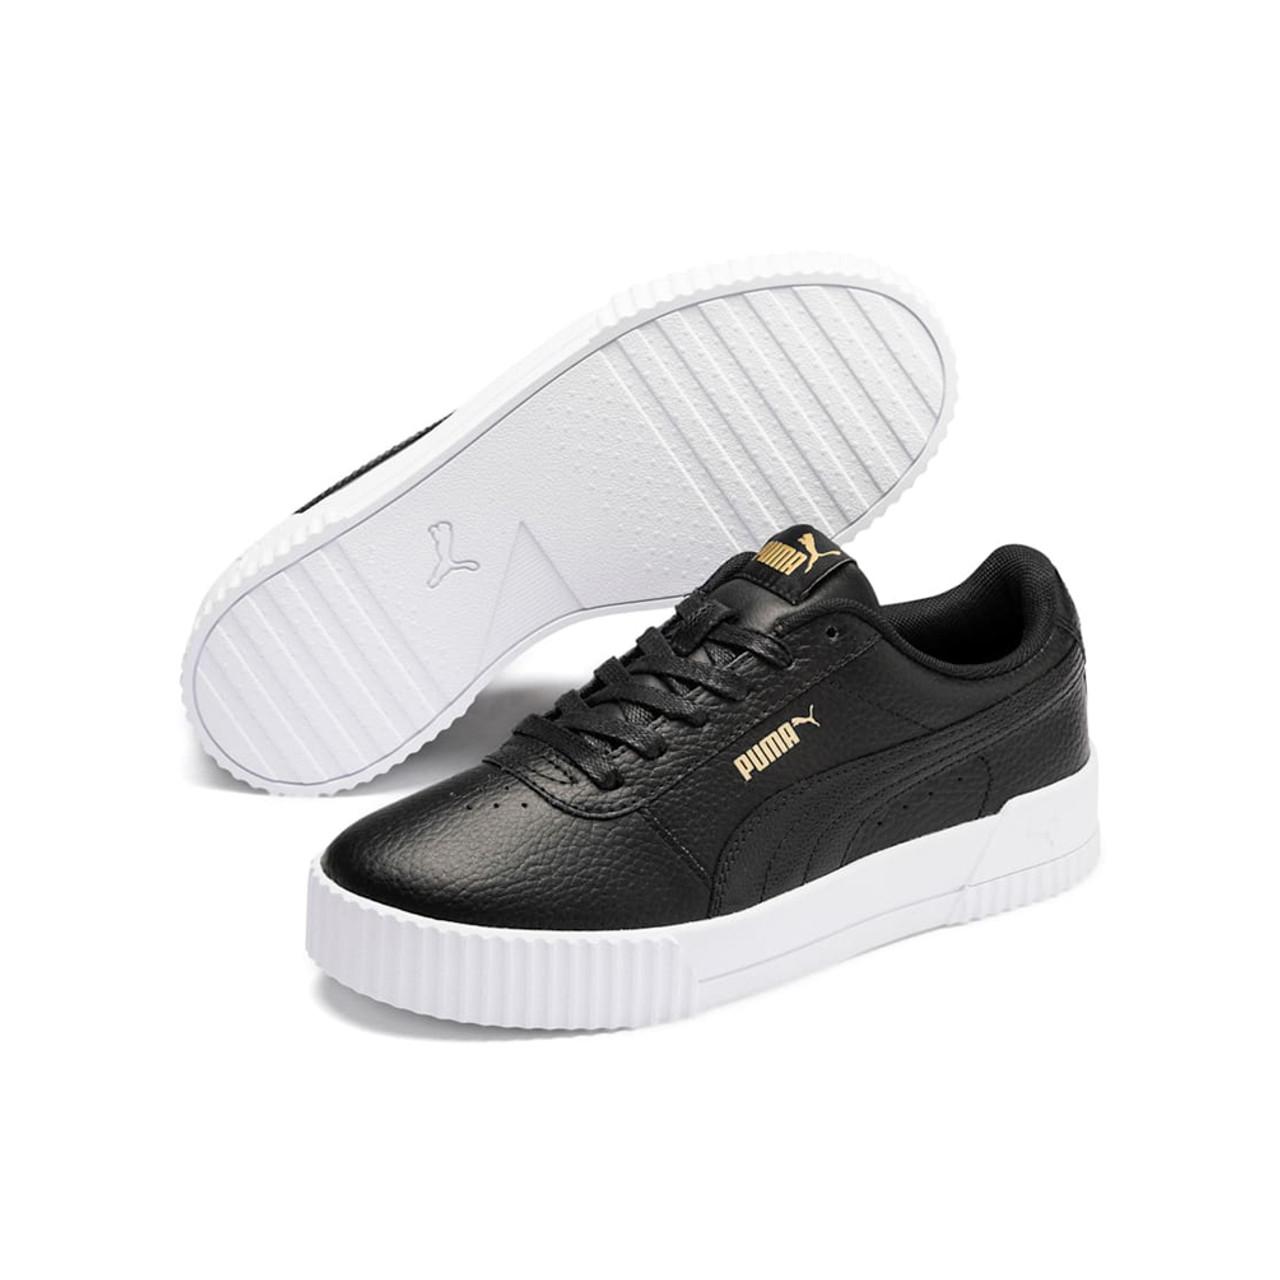 Puma Women's Carina Lux L Sneaker BlackBlack